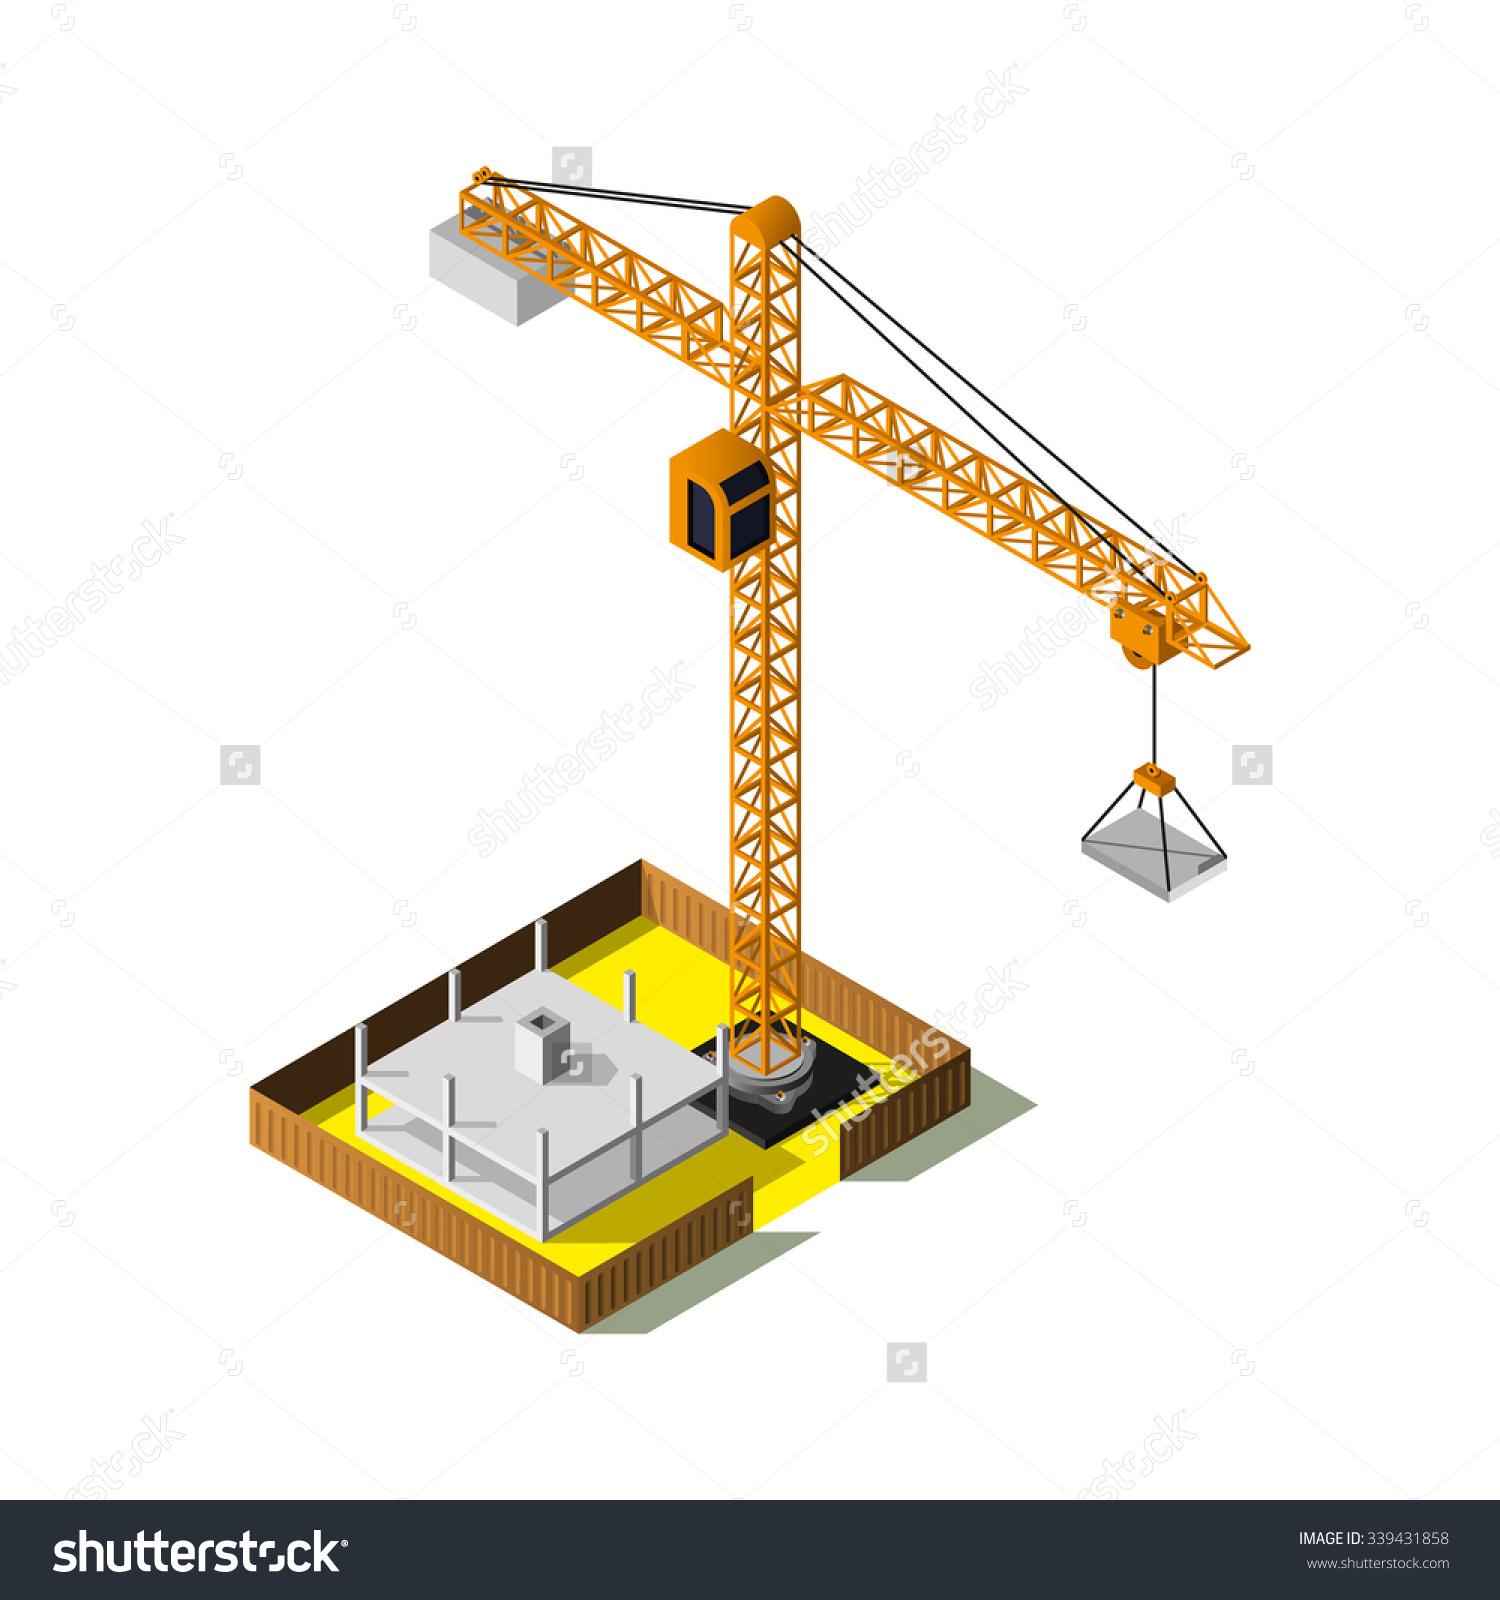 Isometric Industrial Crane Isometric Construction Site Stock.